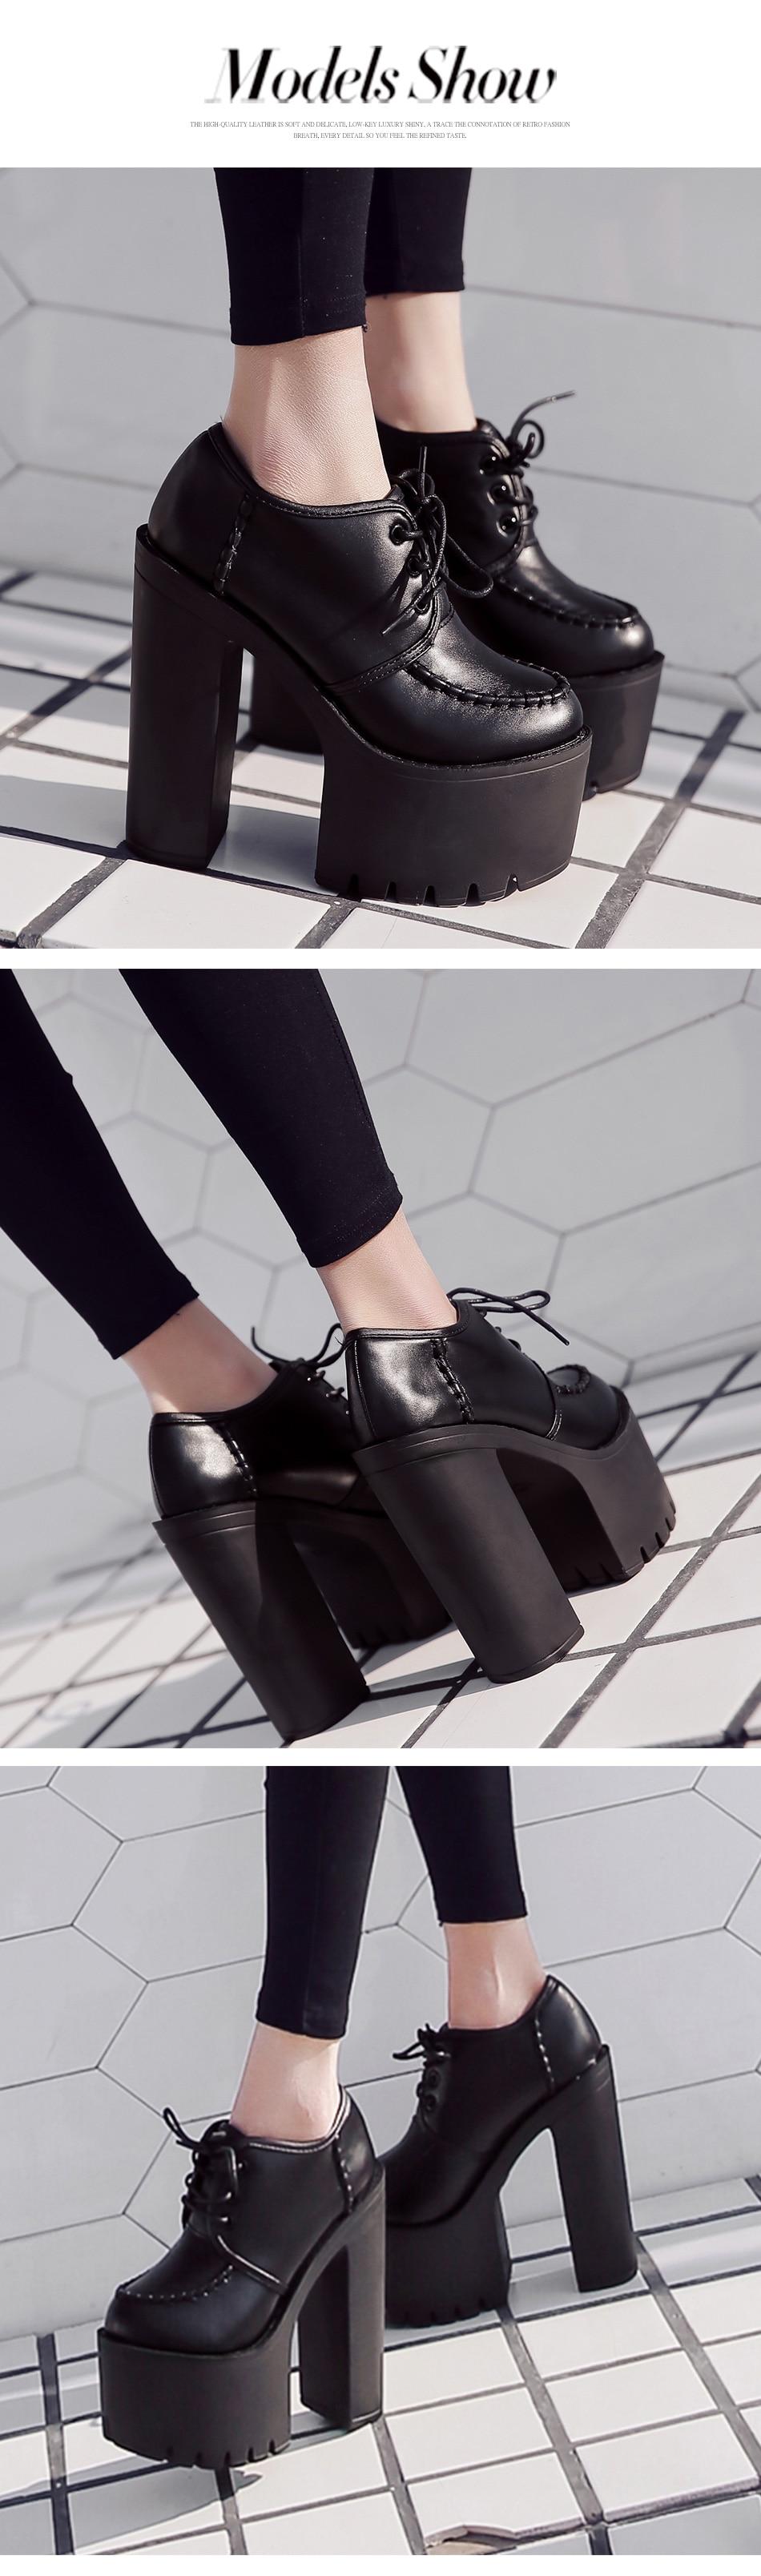 shoes woman high heel platform